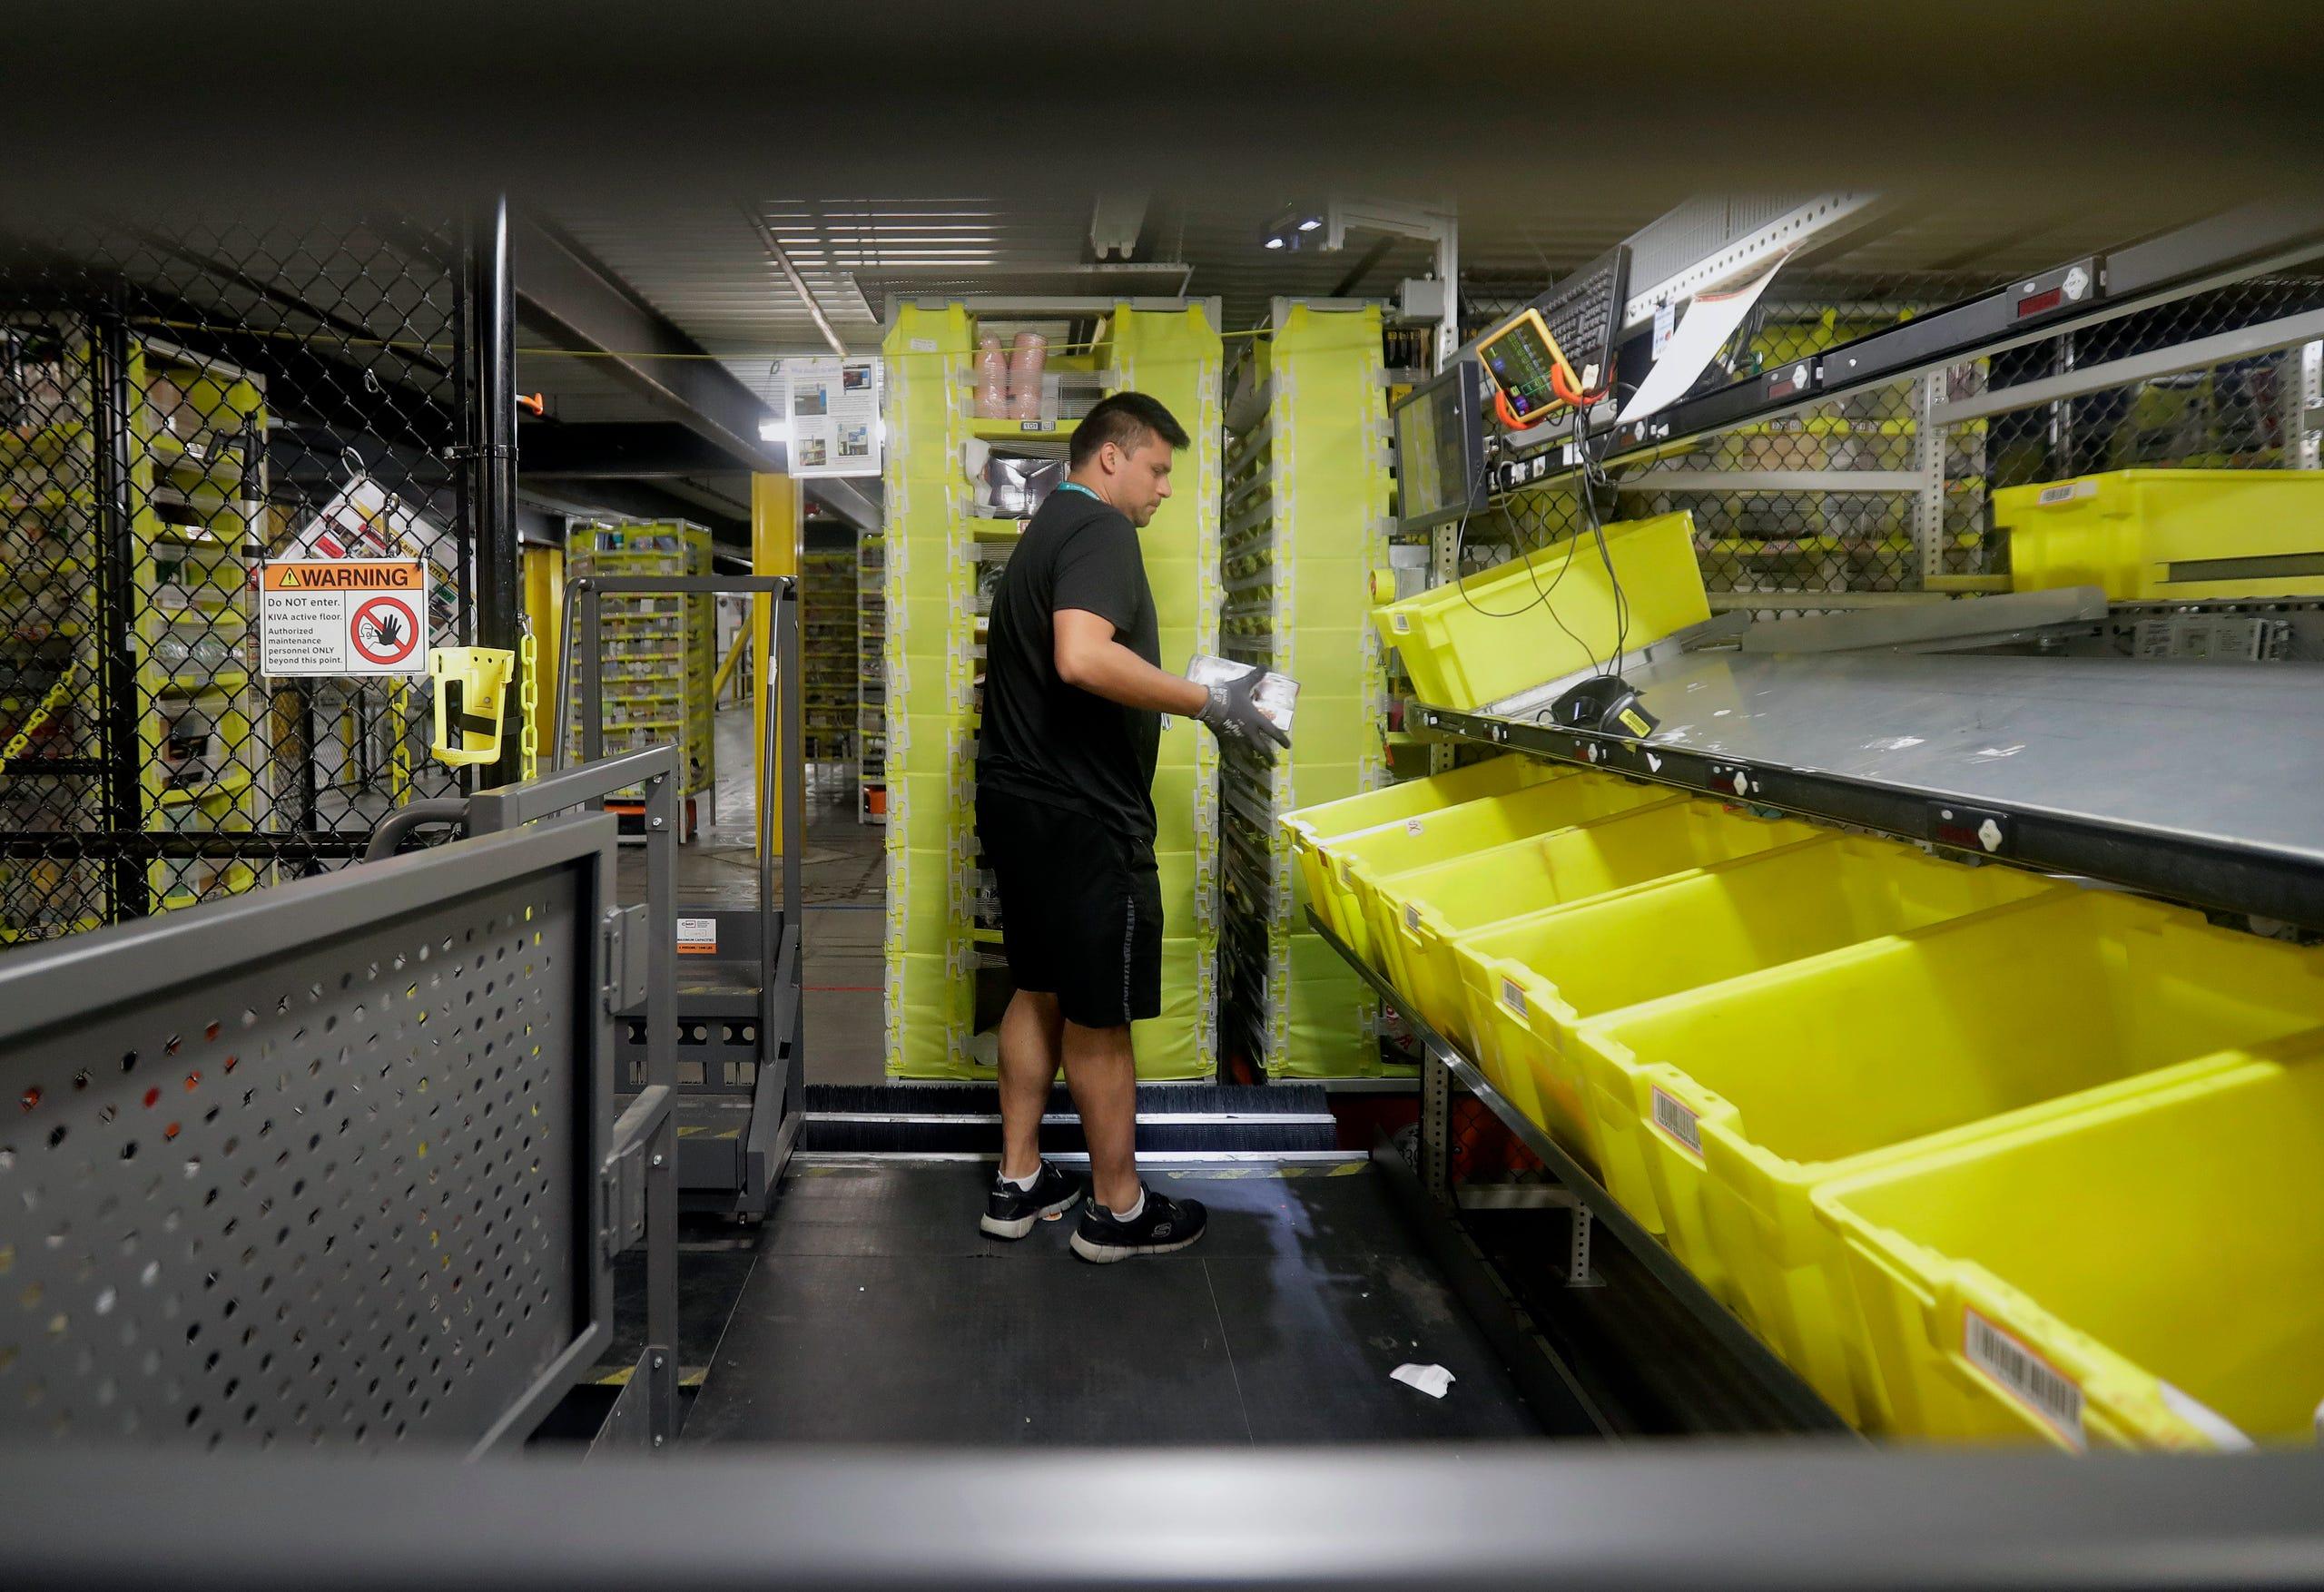 A look inside an Amazon warehouse